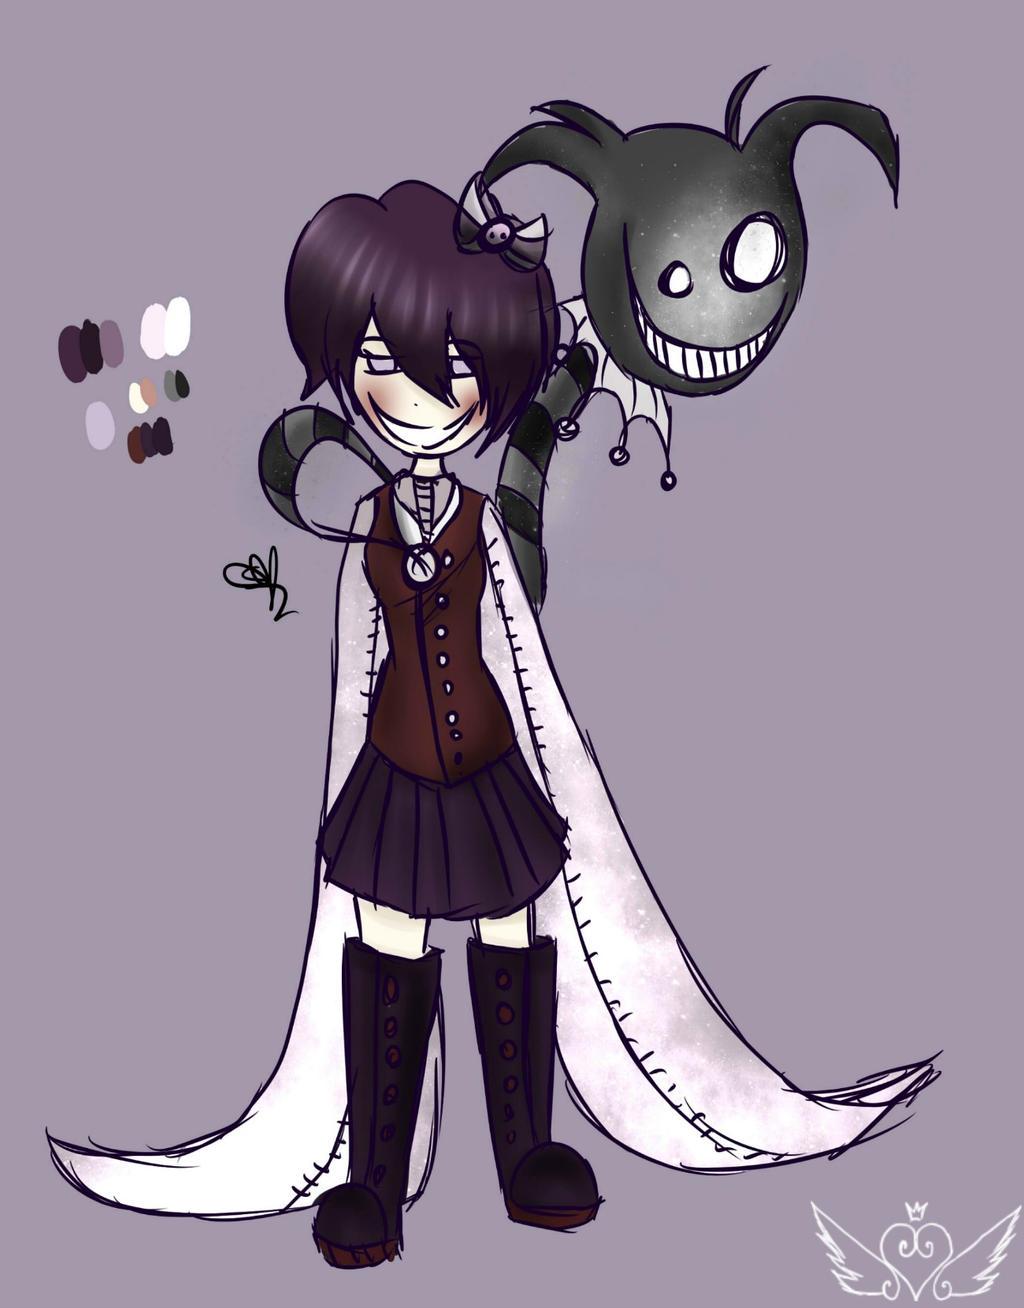 [HauntedManor] Imaginary Friend by OpalesquePrincess